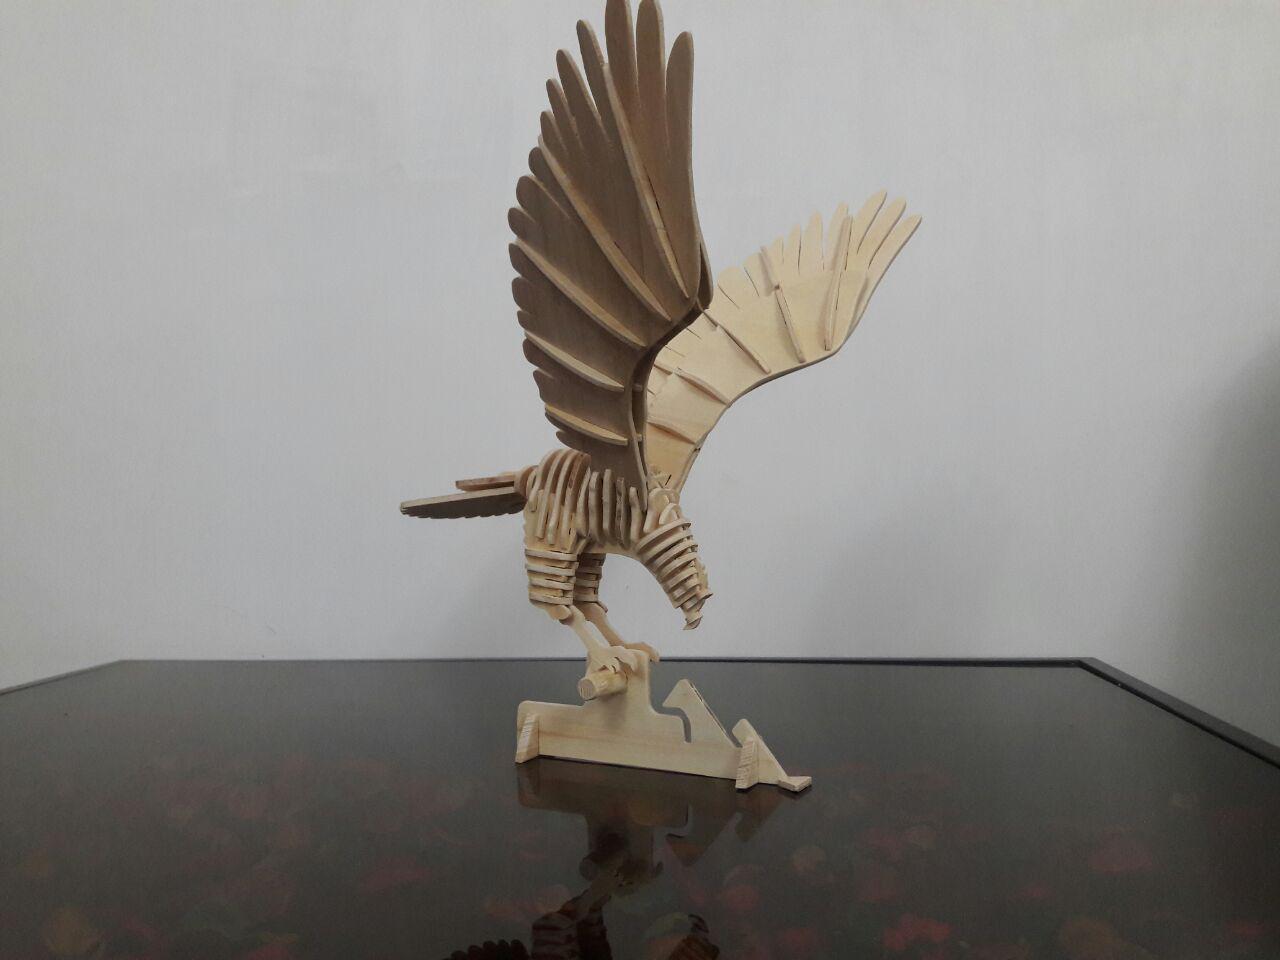 Wooden Bird Cnc Cutting Free DXF File